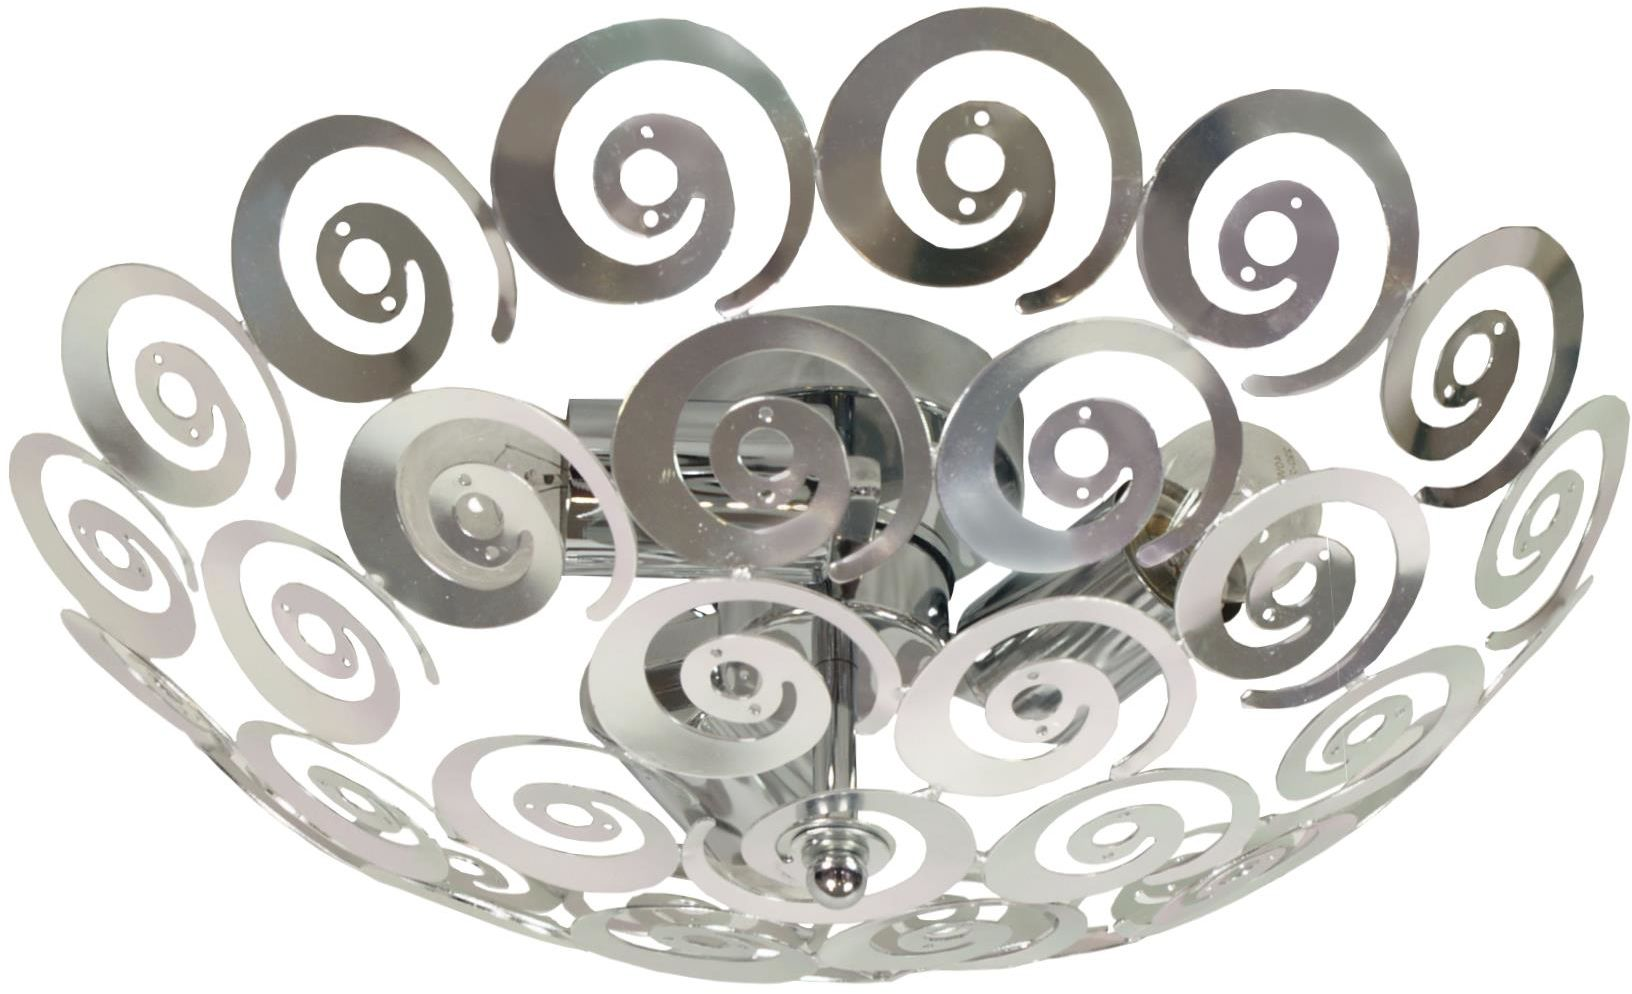 Candellux VOLANS1 14-97517 plafon lampa sufitowa metal srebrny 3X60W E27 40 cm